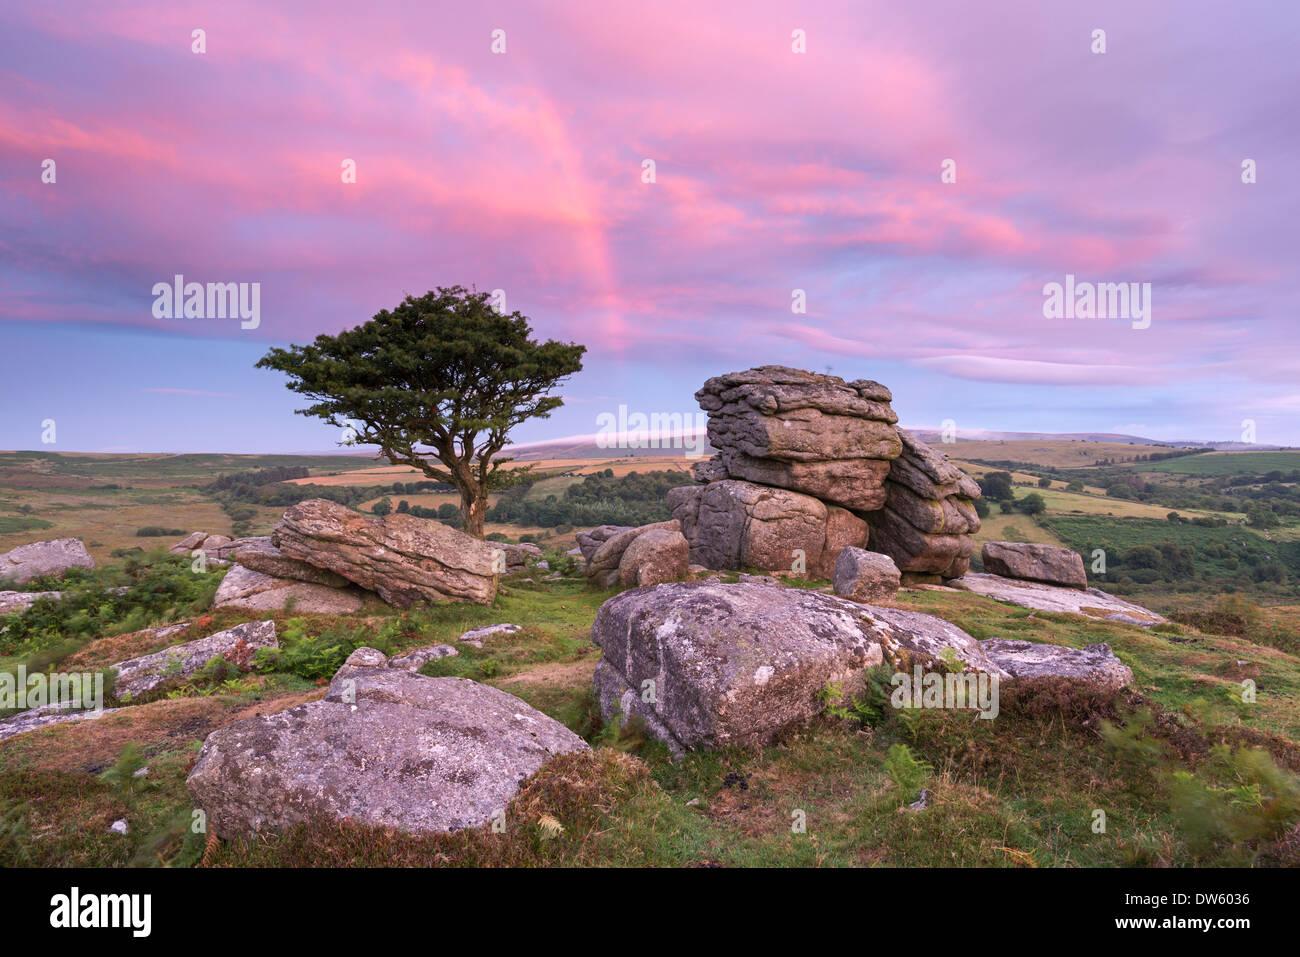 Alba sopra arcobaleno Holwell Tor, Dartmoor Devon, Inghilterra. Estate (Agosto) 2013. Foto Stock